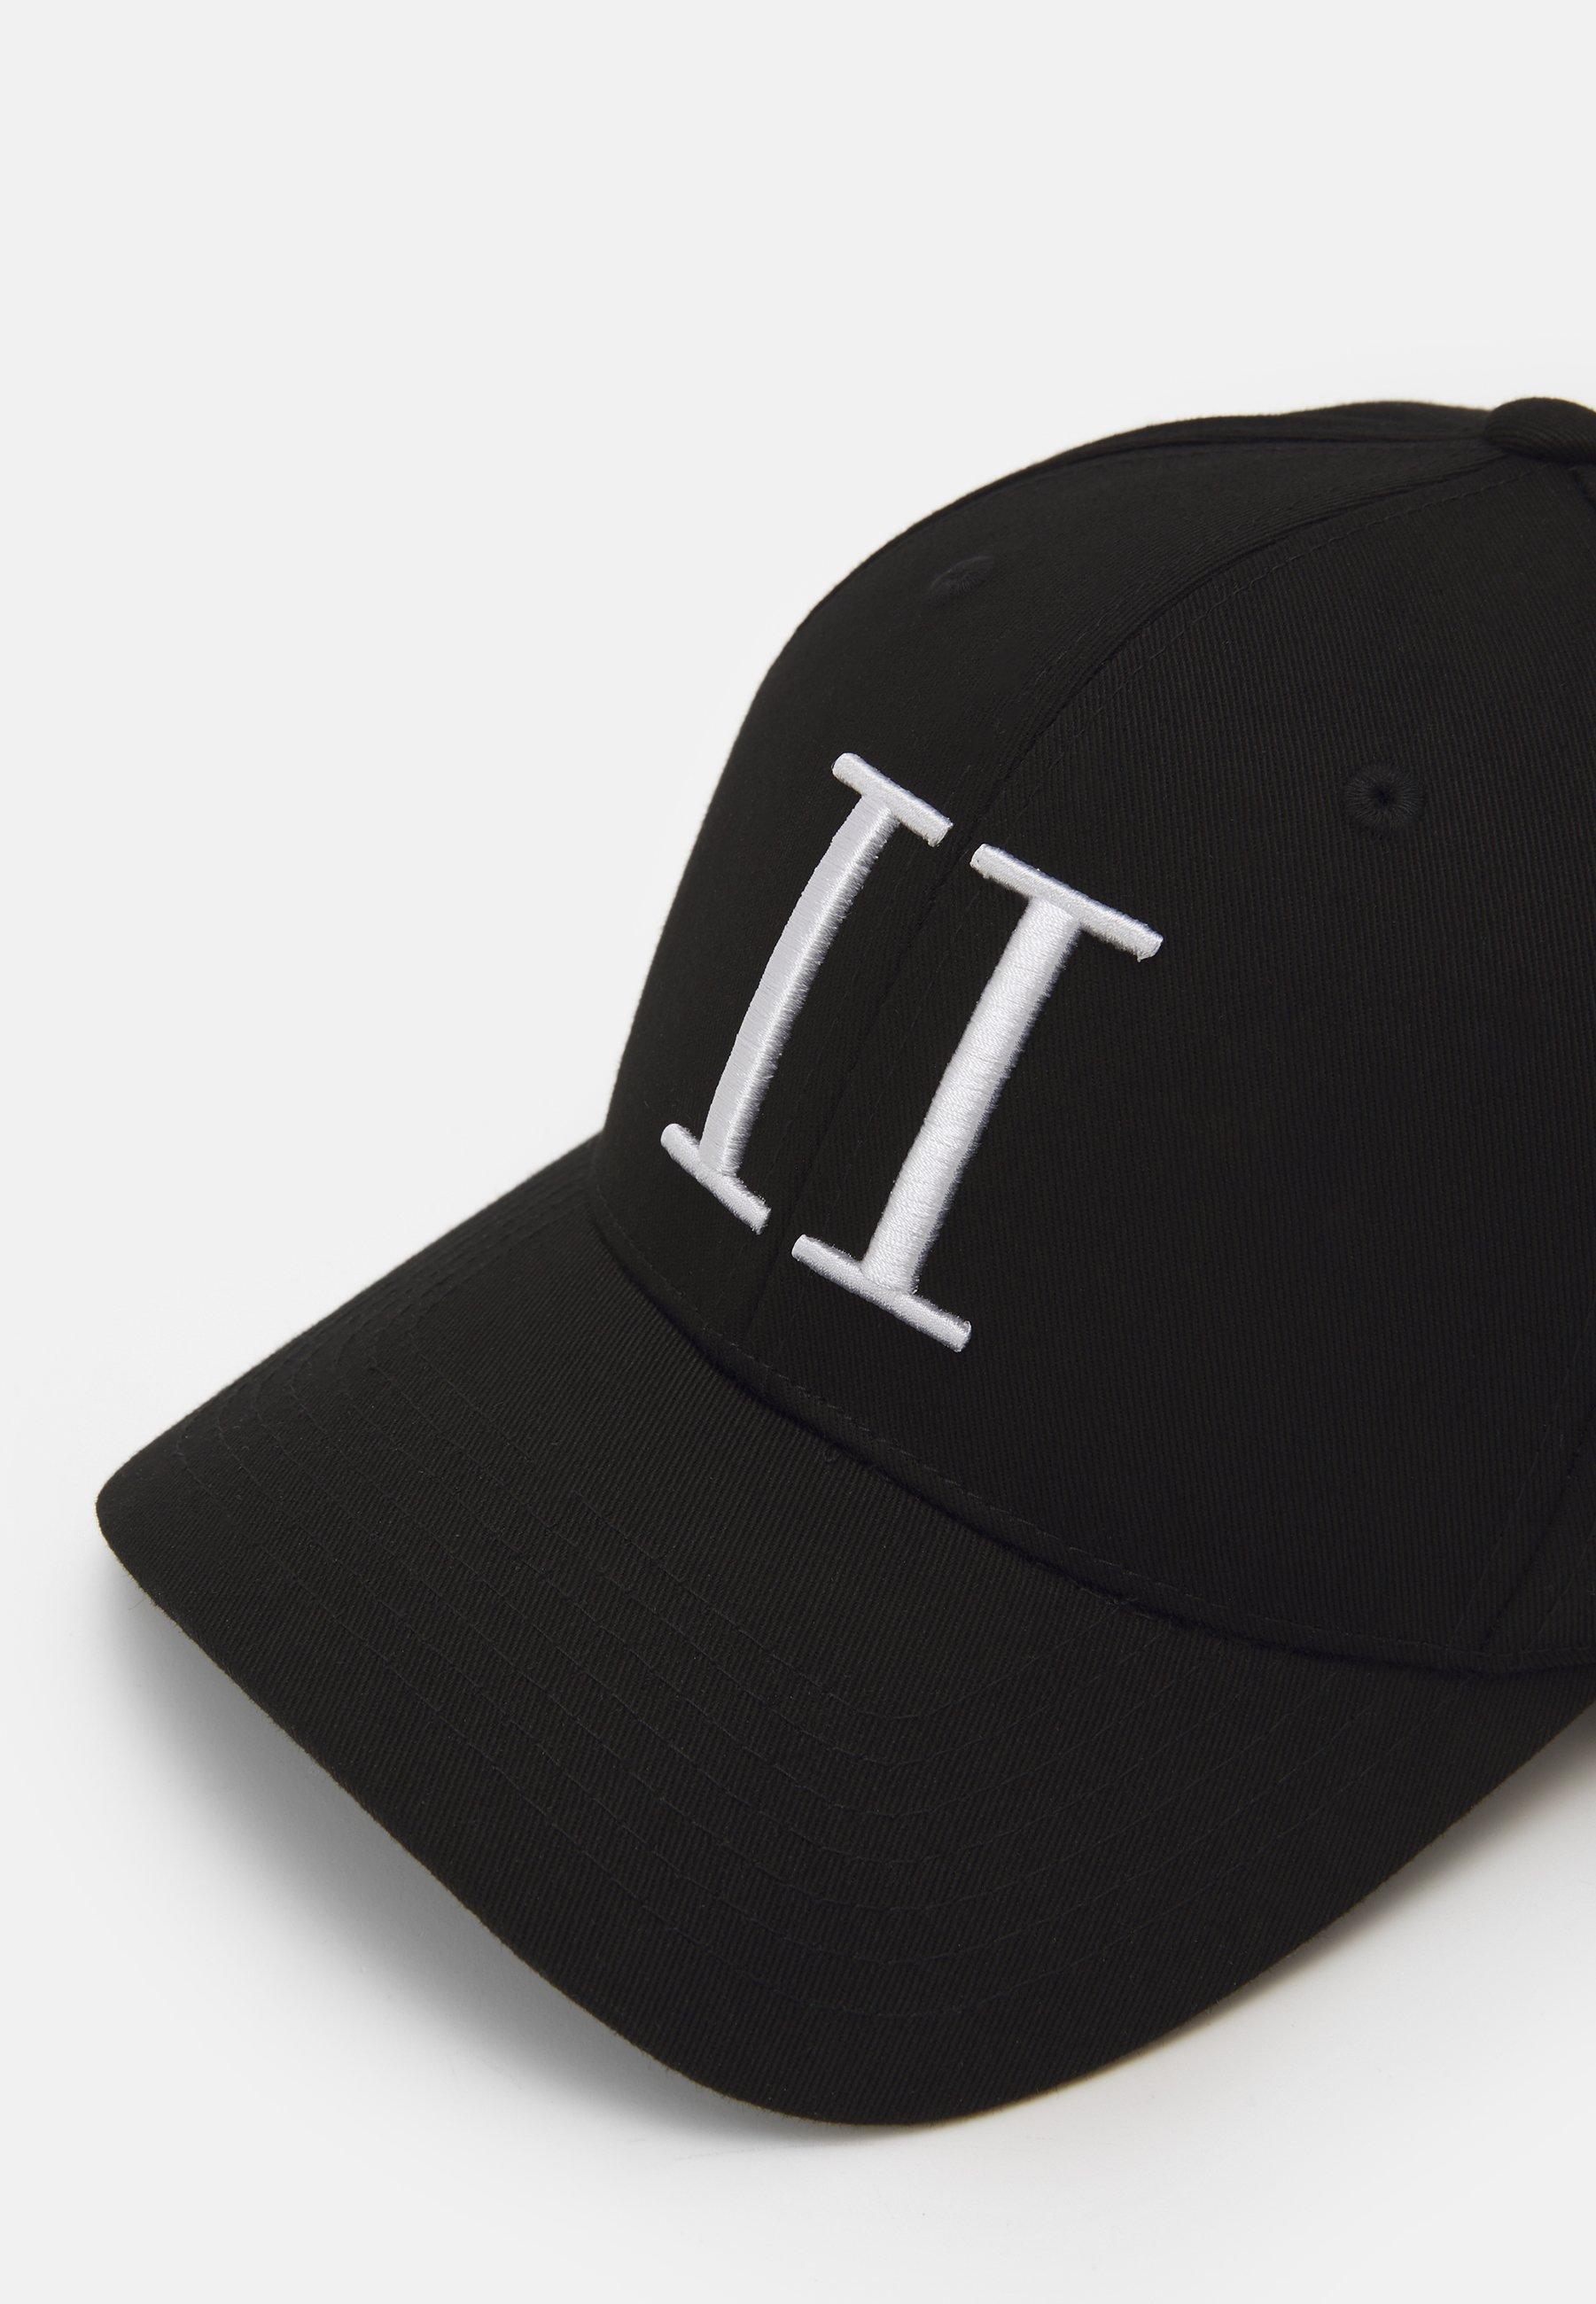 Les Deux BASEBALL CAP - Cap - black/white/svart 8d9HIheYWsctkpd